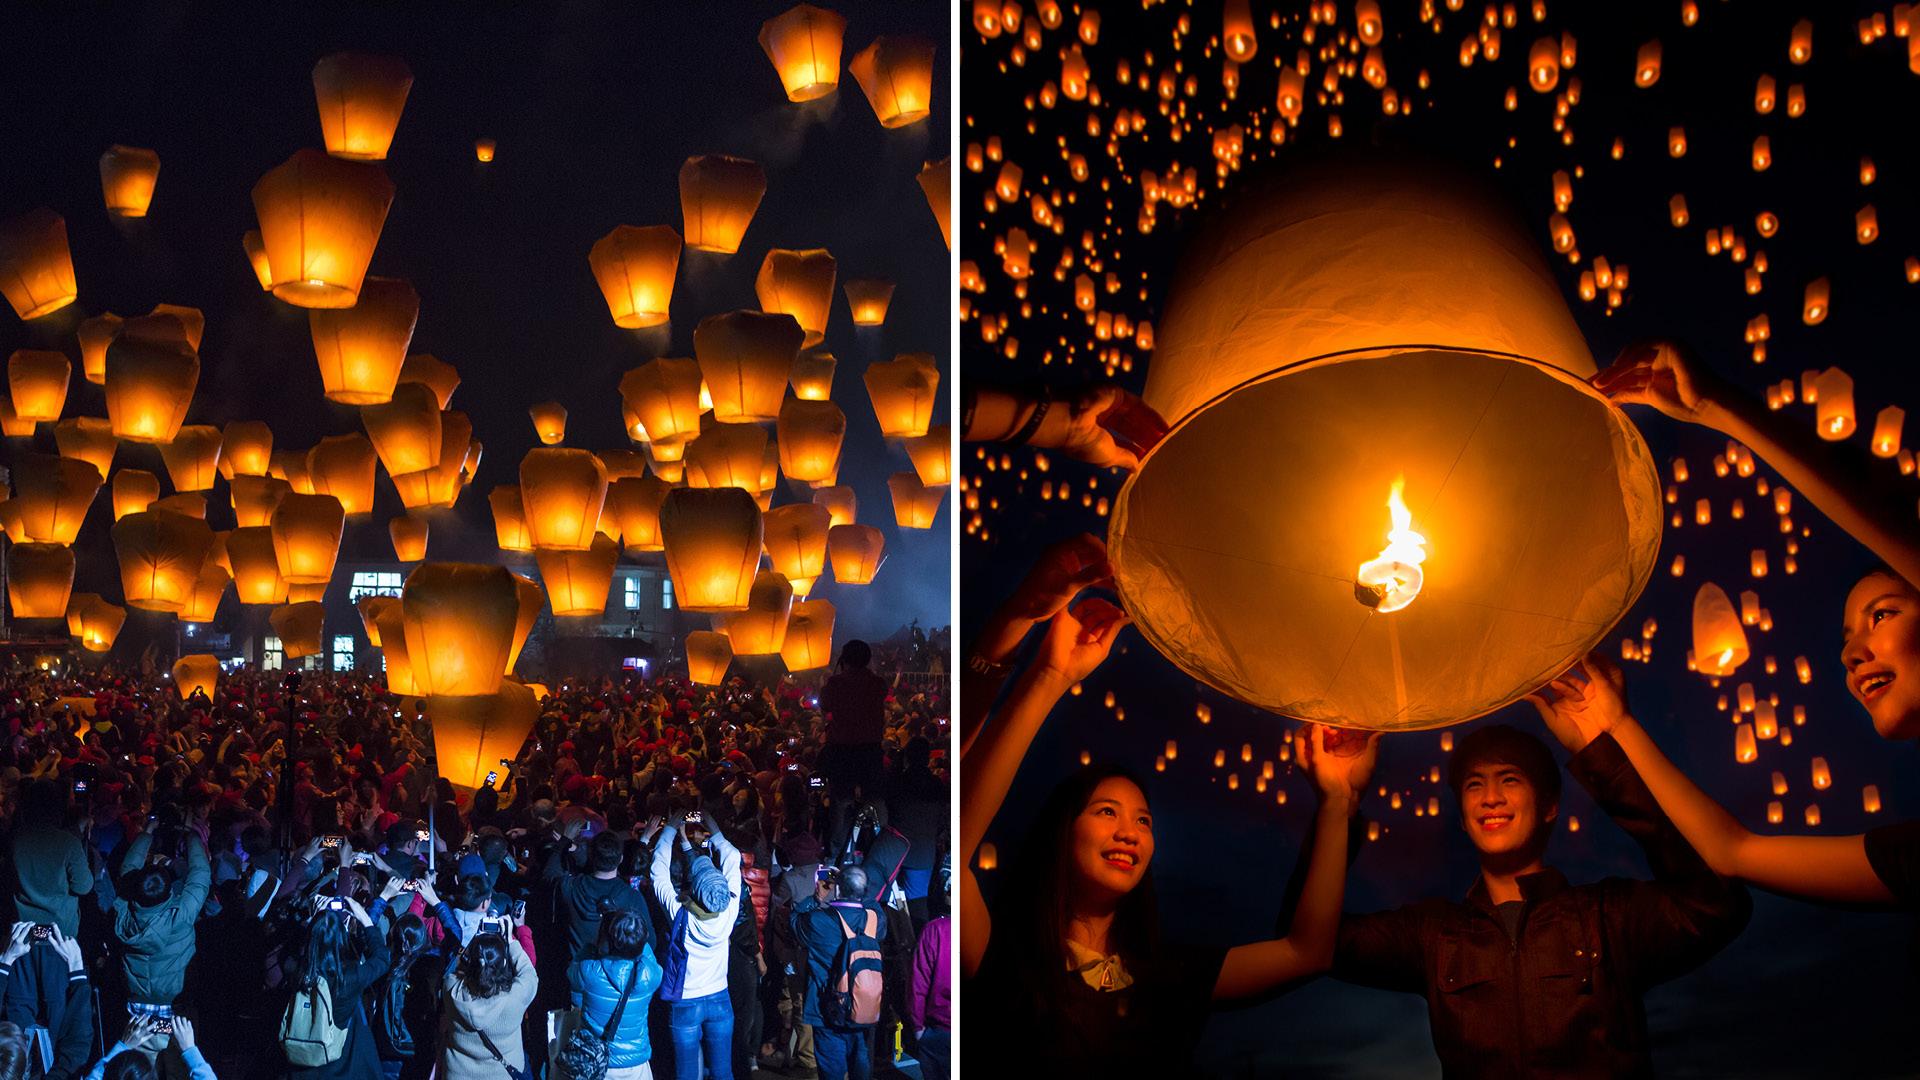 lantern festival - photo #14